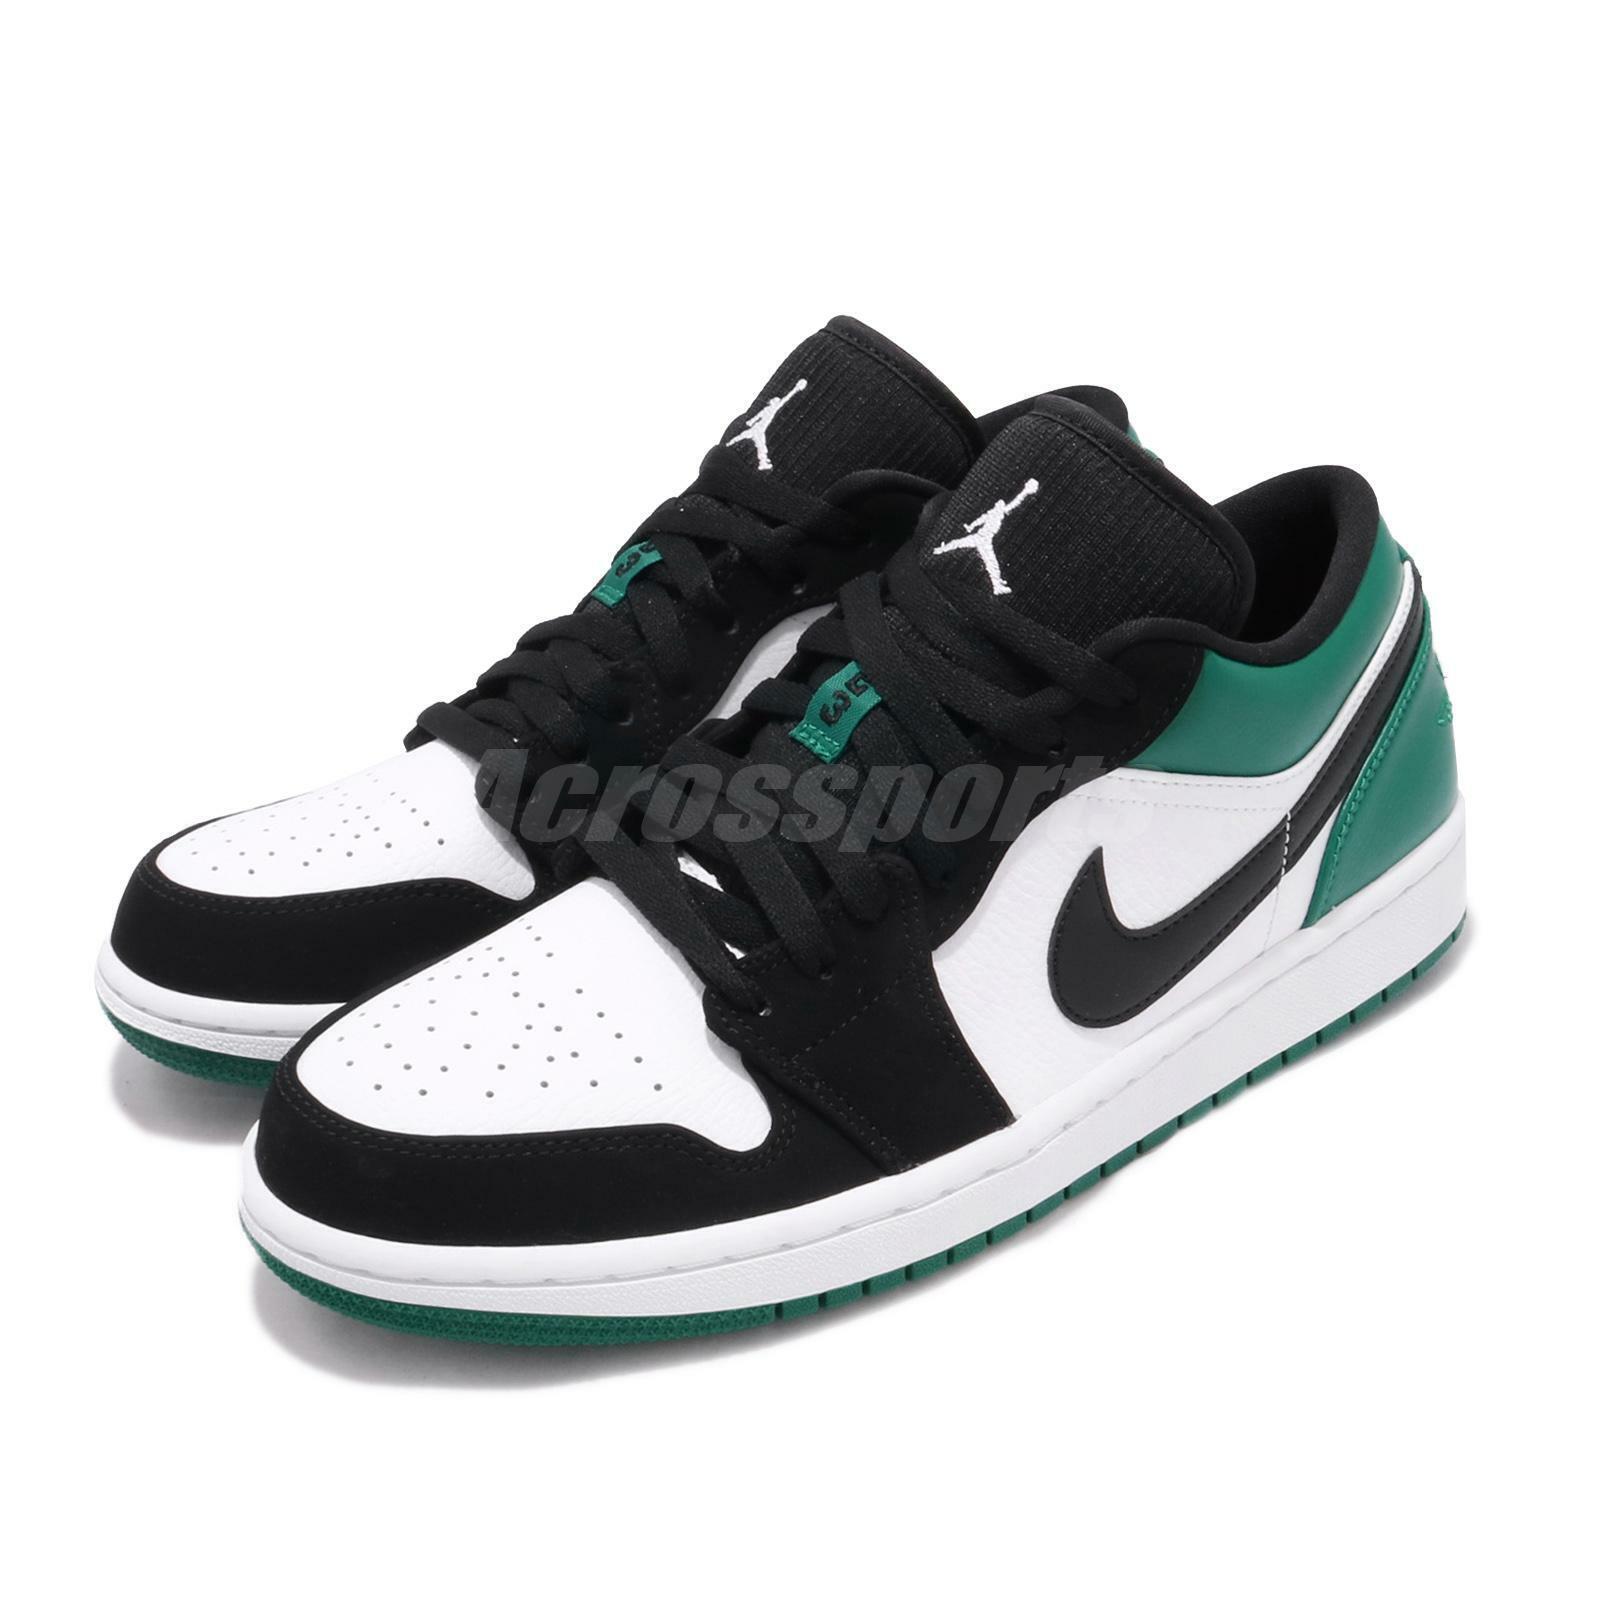 49df53bf49 Nike Air Jordan 1 Low I AJ1 Mystic Green White Black Men Shoe Sneaker  553558-113